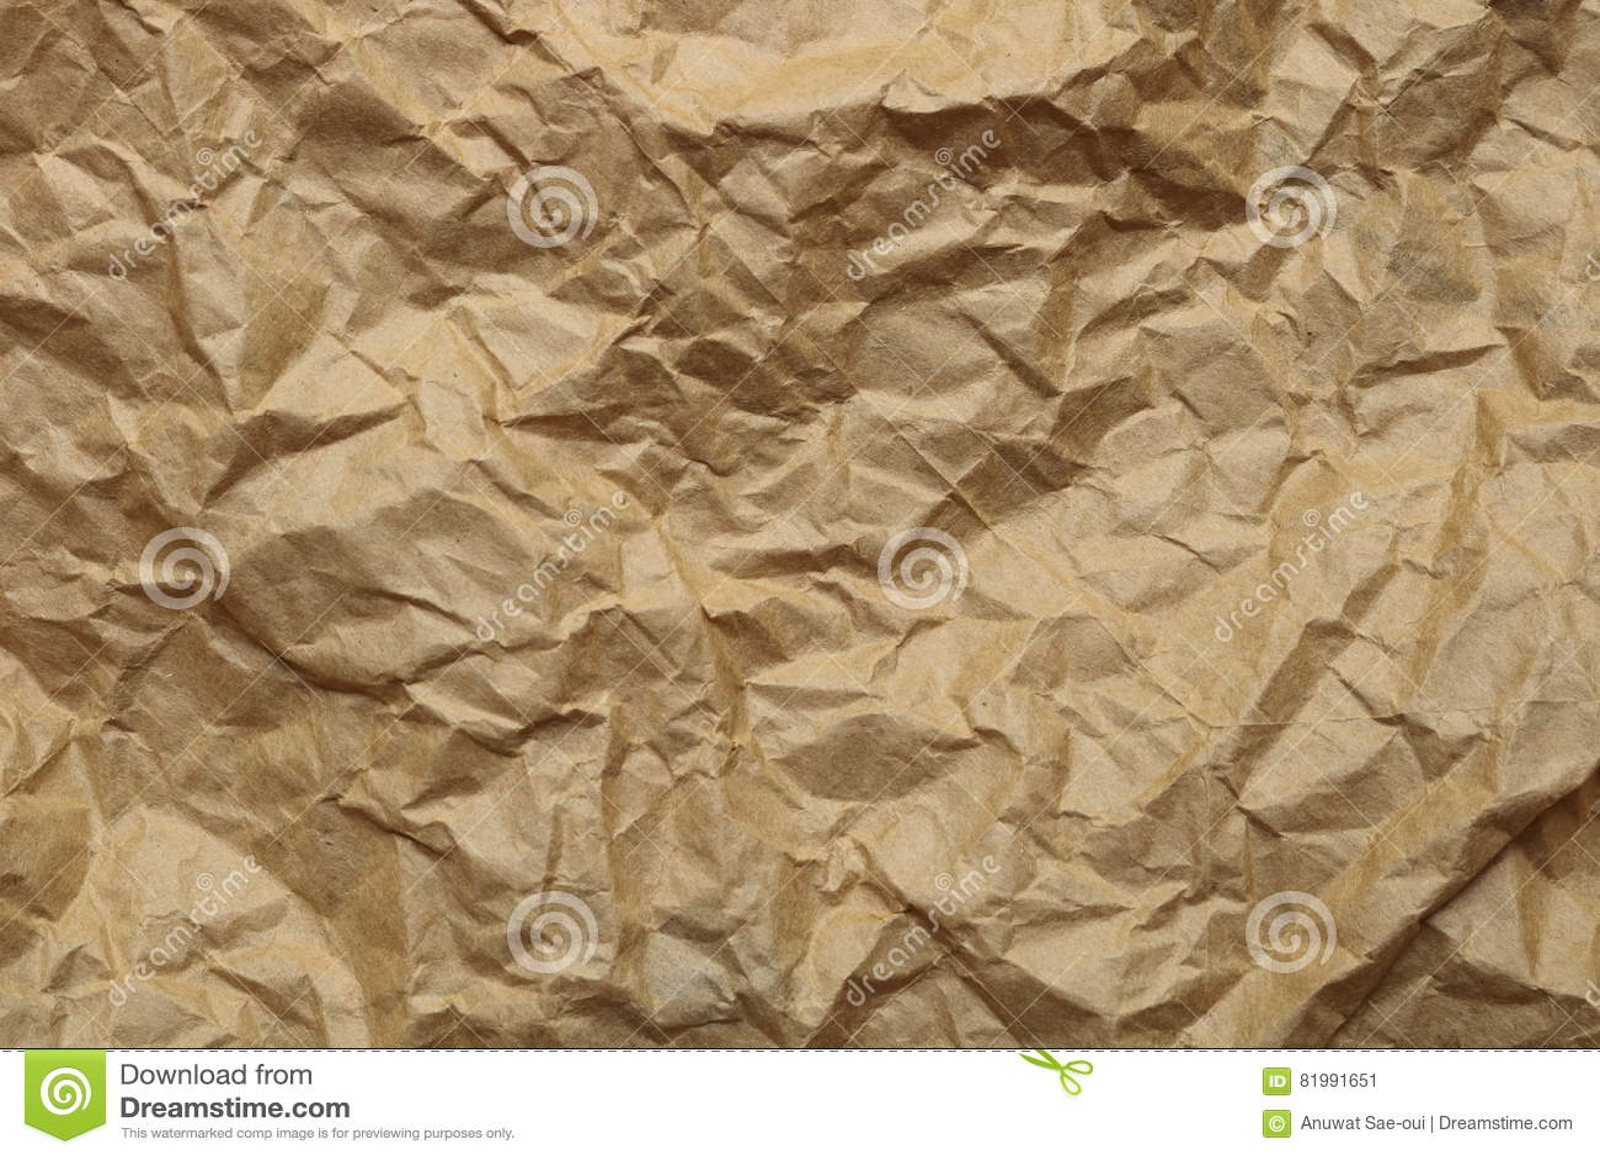 Bruine verfrommelde document textuur